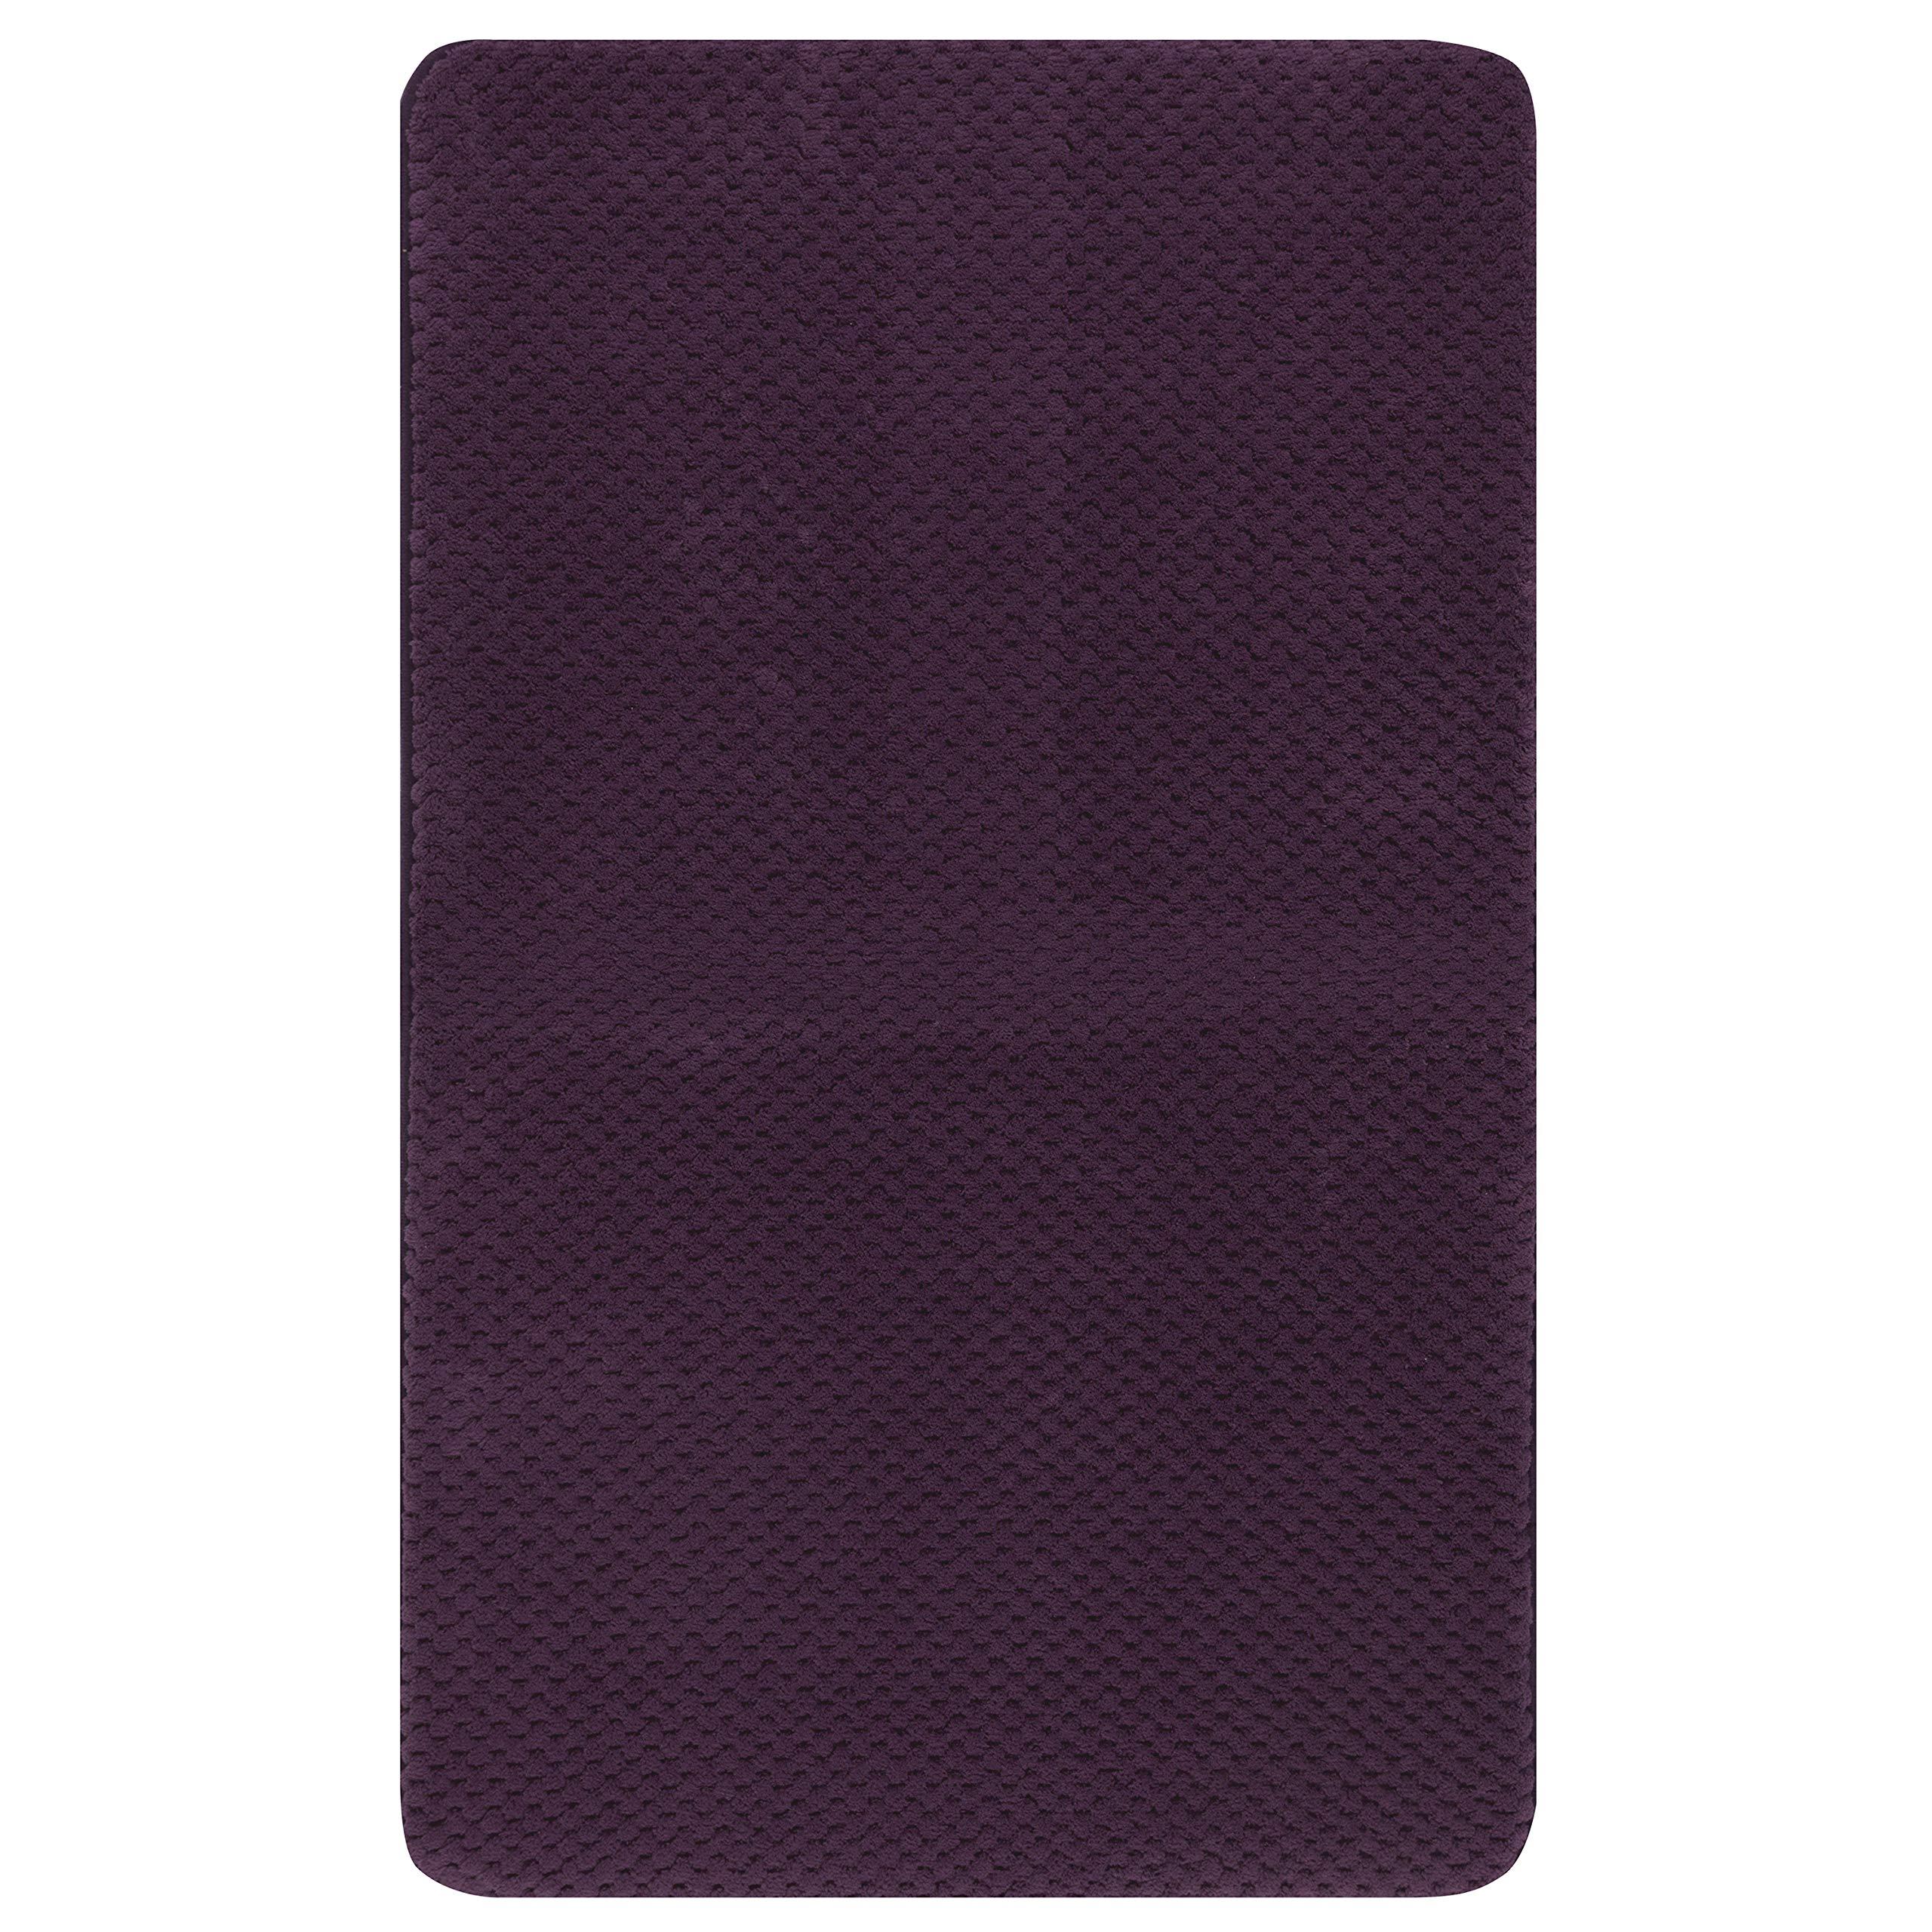 Mohawk Wilshire Bath Rug, 1'5x2', Purple